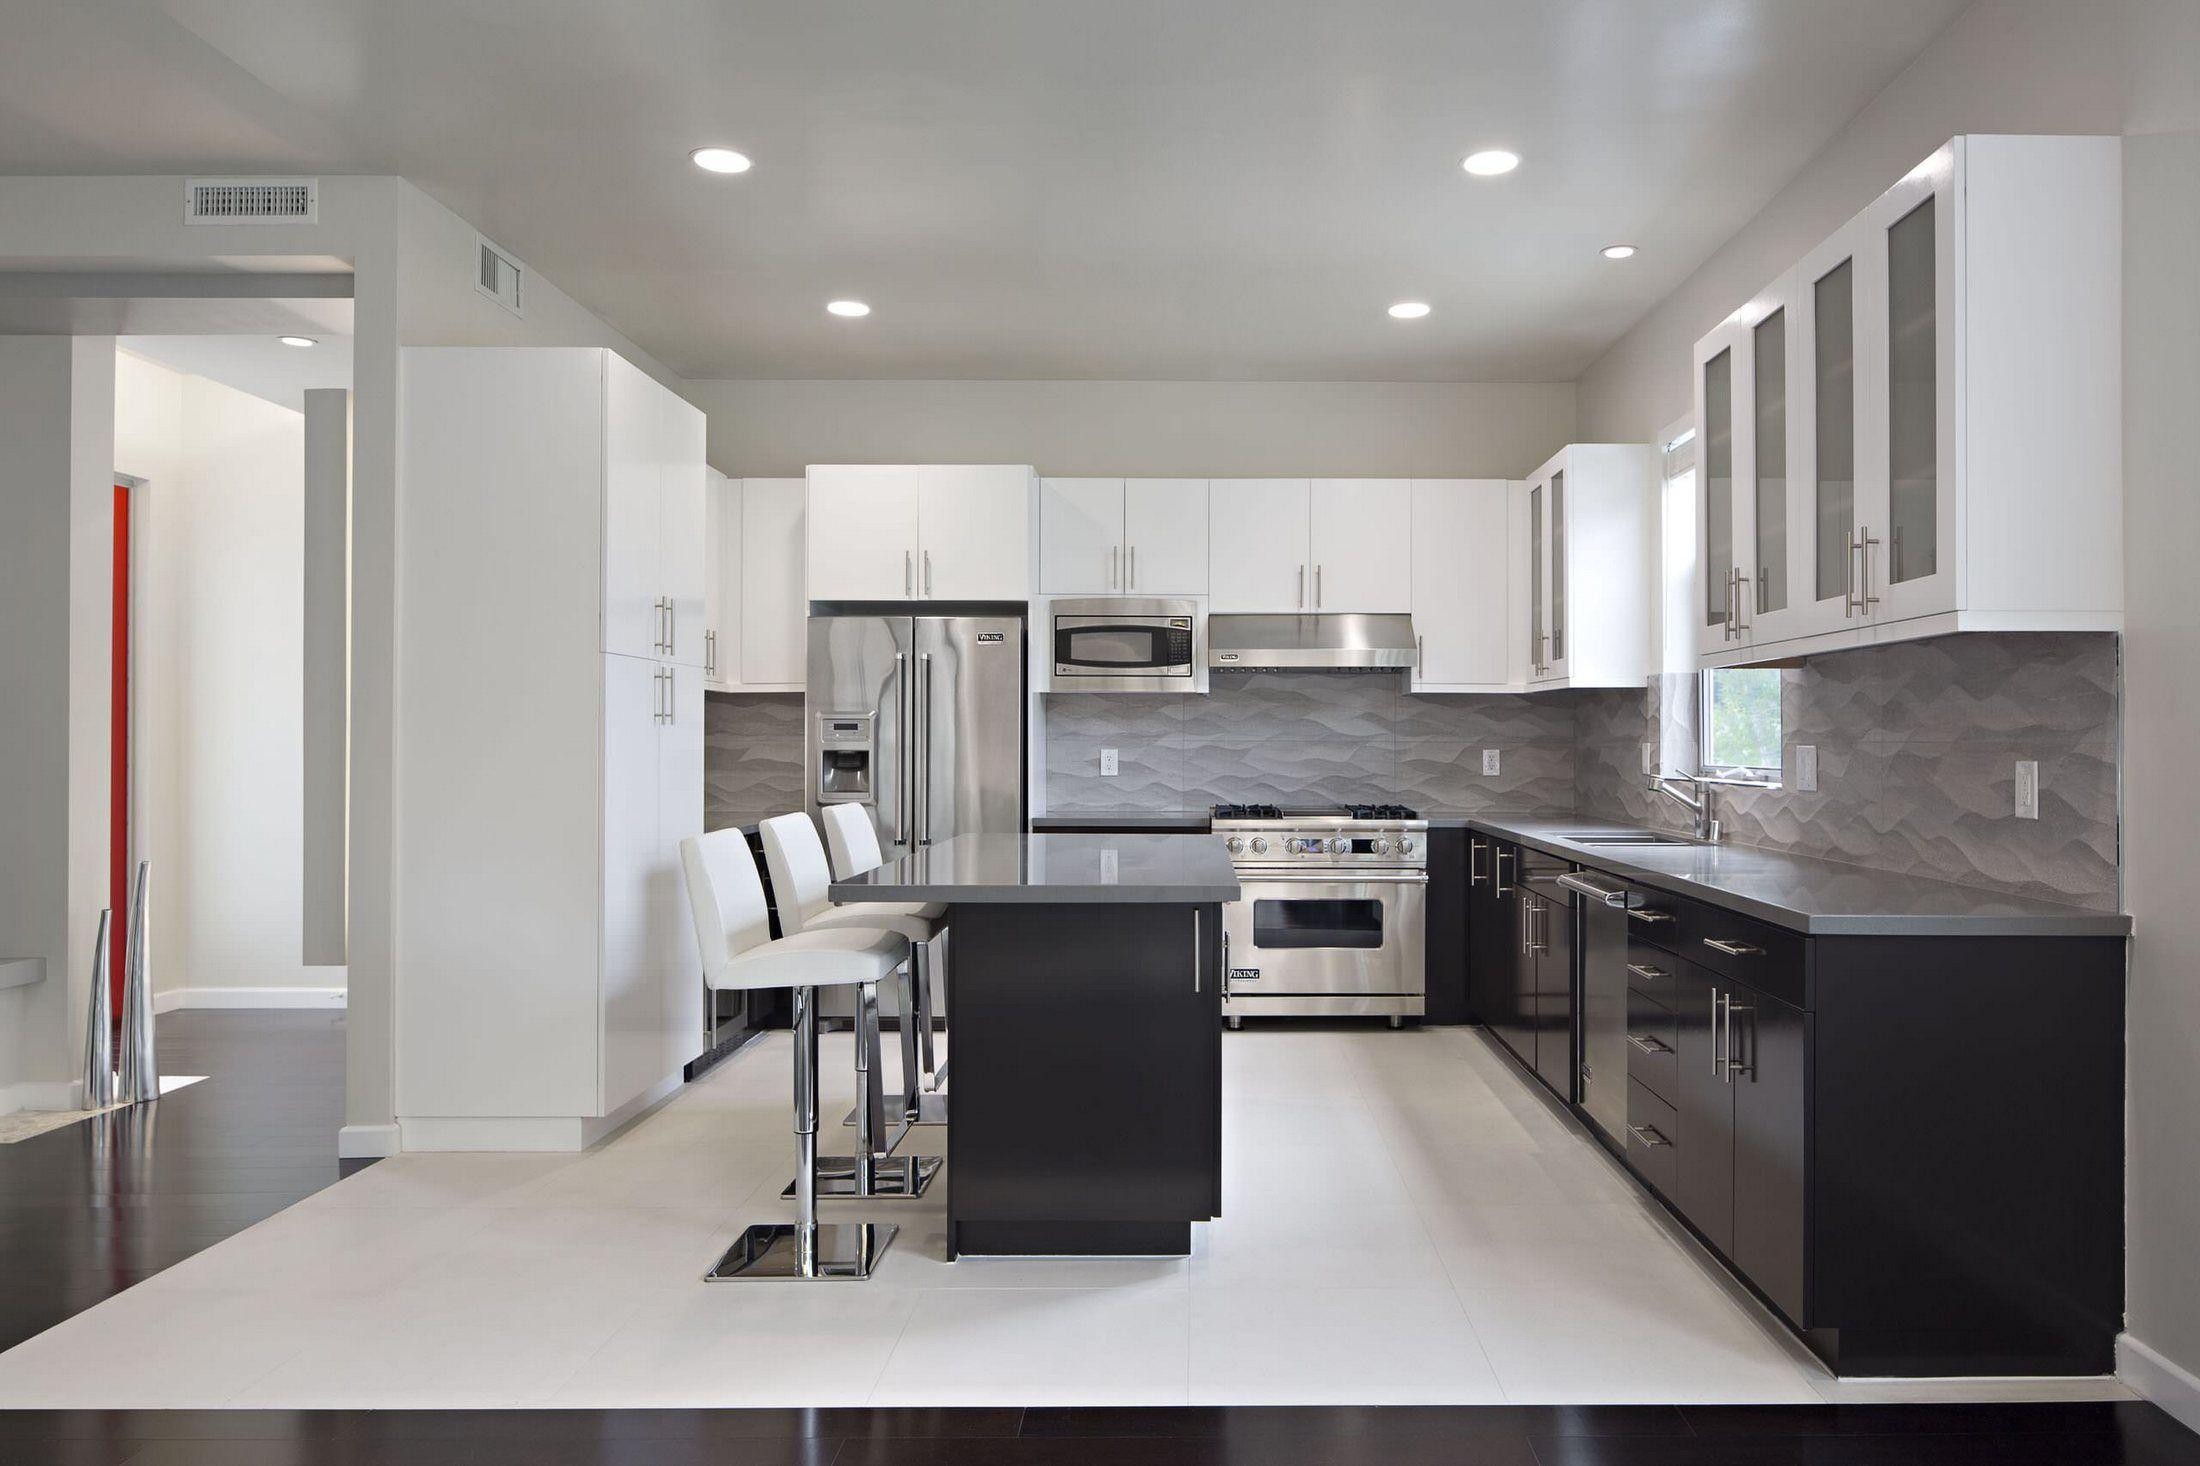 Mills Pride Kitchen Cabinets Home Depot Refacing Kitchen Cabinet Doors Shop All Kitchen